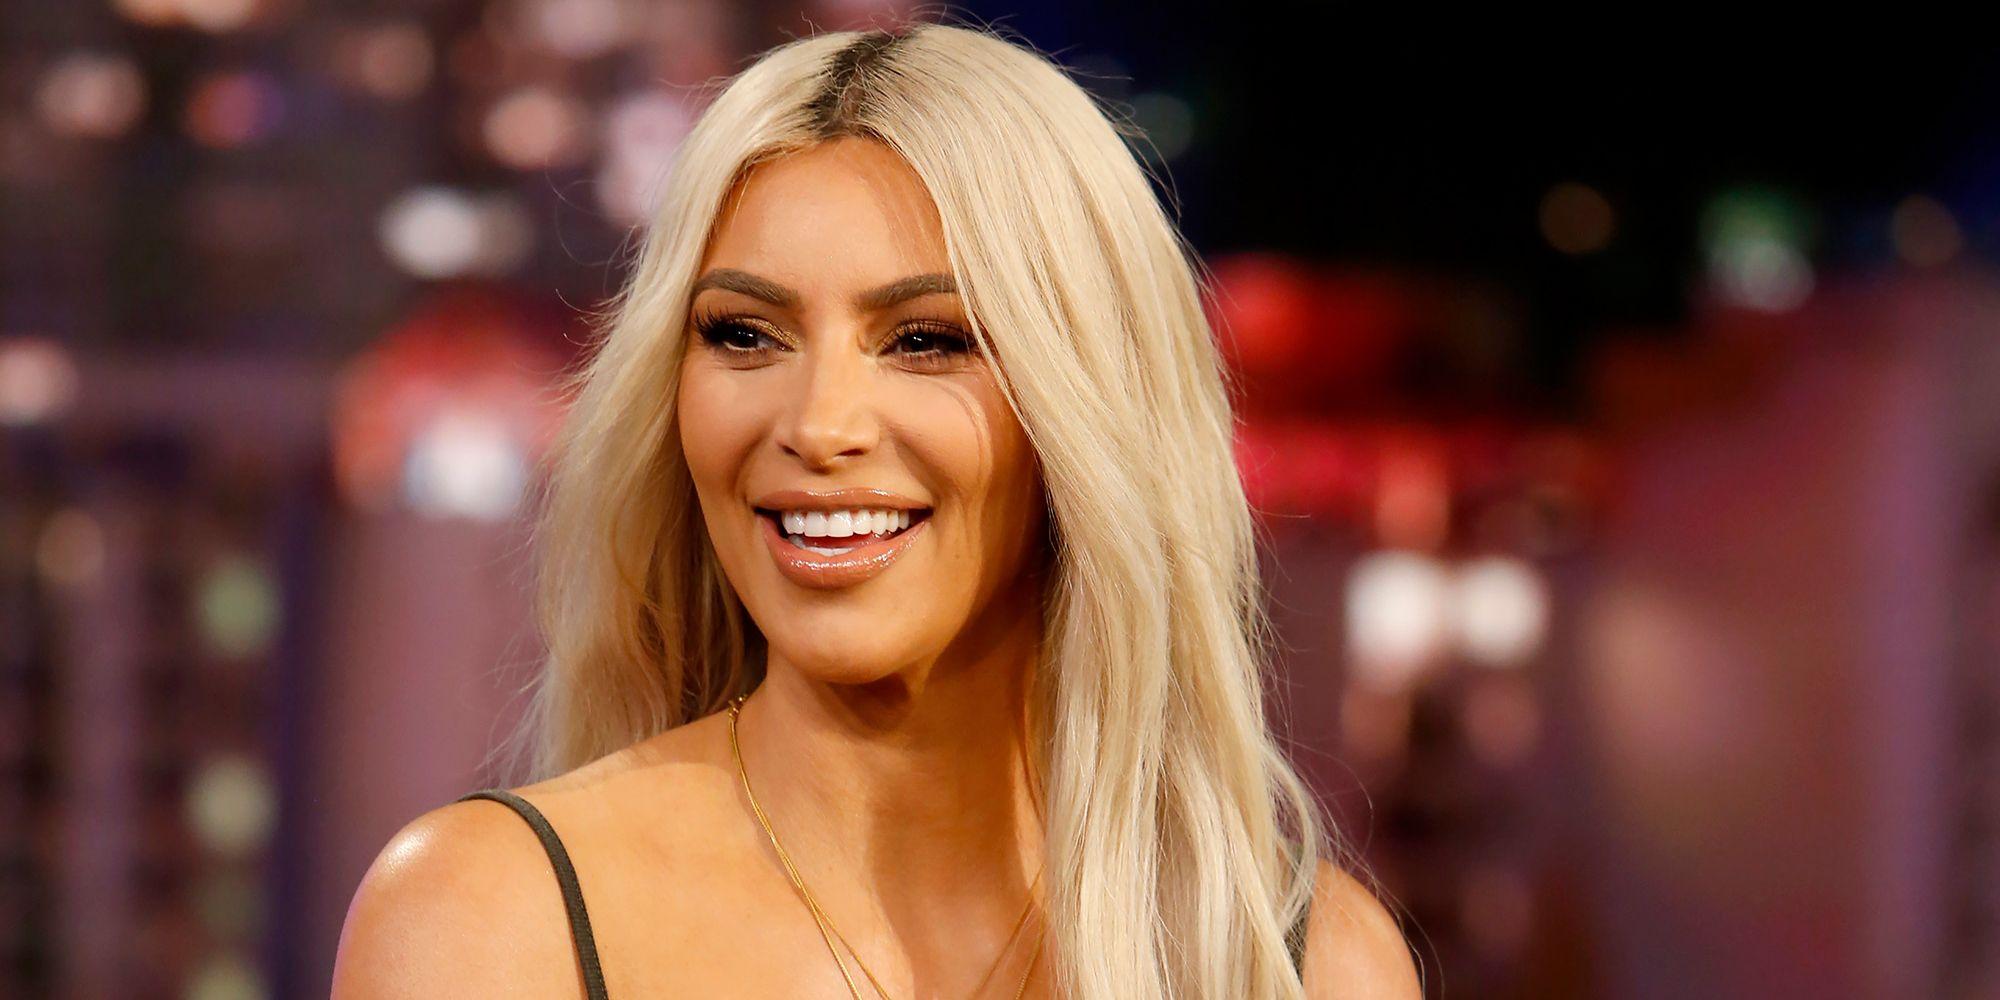 Kim Kardashian Made a Hilarious Mistake on Kourtney Kardashian's Birthday Card